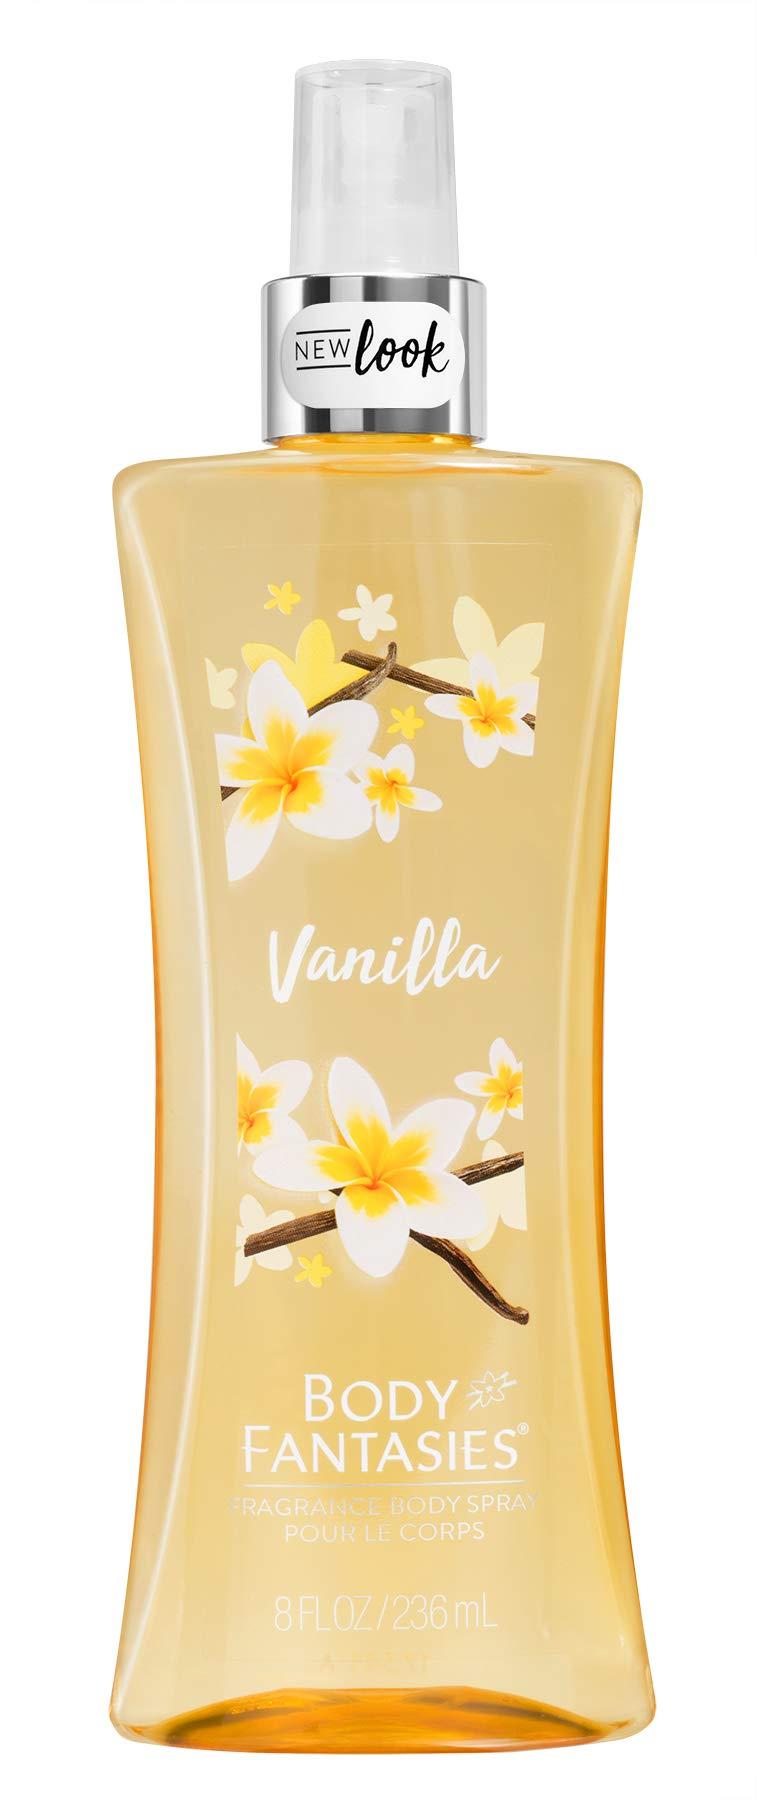 Parfums de Coeur Body Fantasies Signature for Women Spray, Vanilla, 8 Ounce